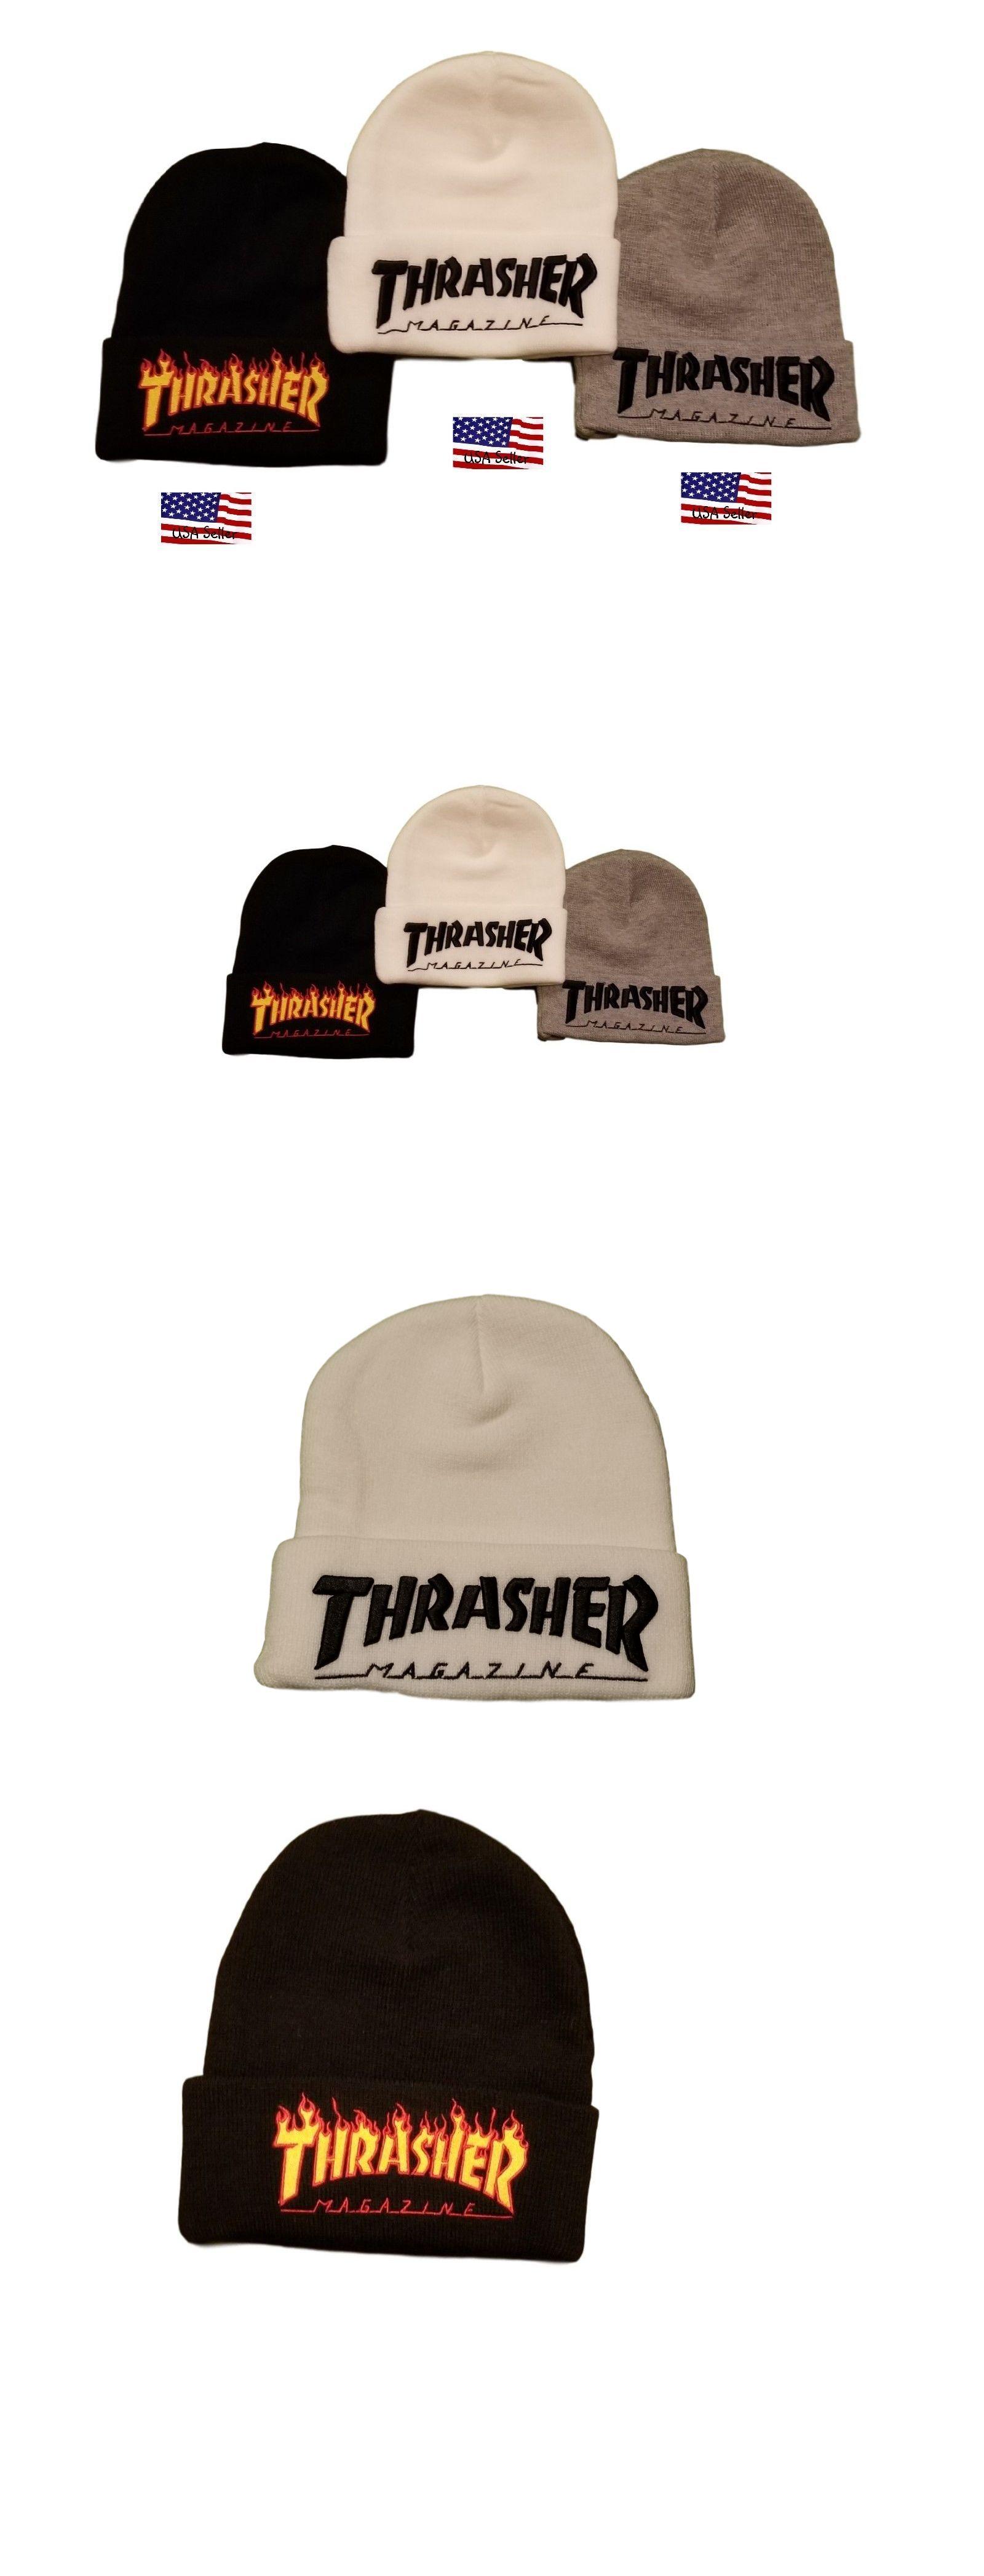 Hats 52365  Thrasher Magazine Logo Embroidered Beanie Hat Cap -  BUY IT NOW  ONLY   15.92 on  eBay  thrasher  magazine  embroidered  beanie a97afee24507